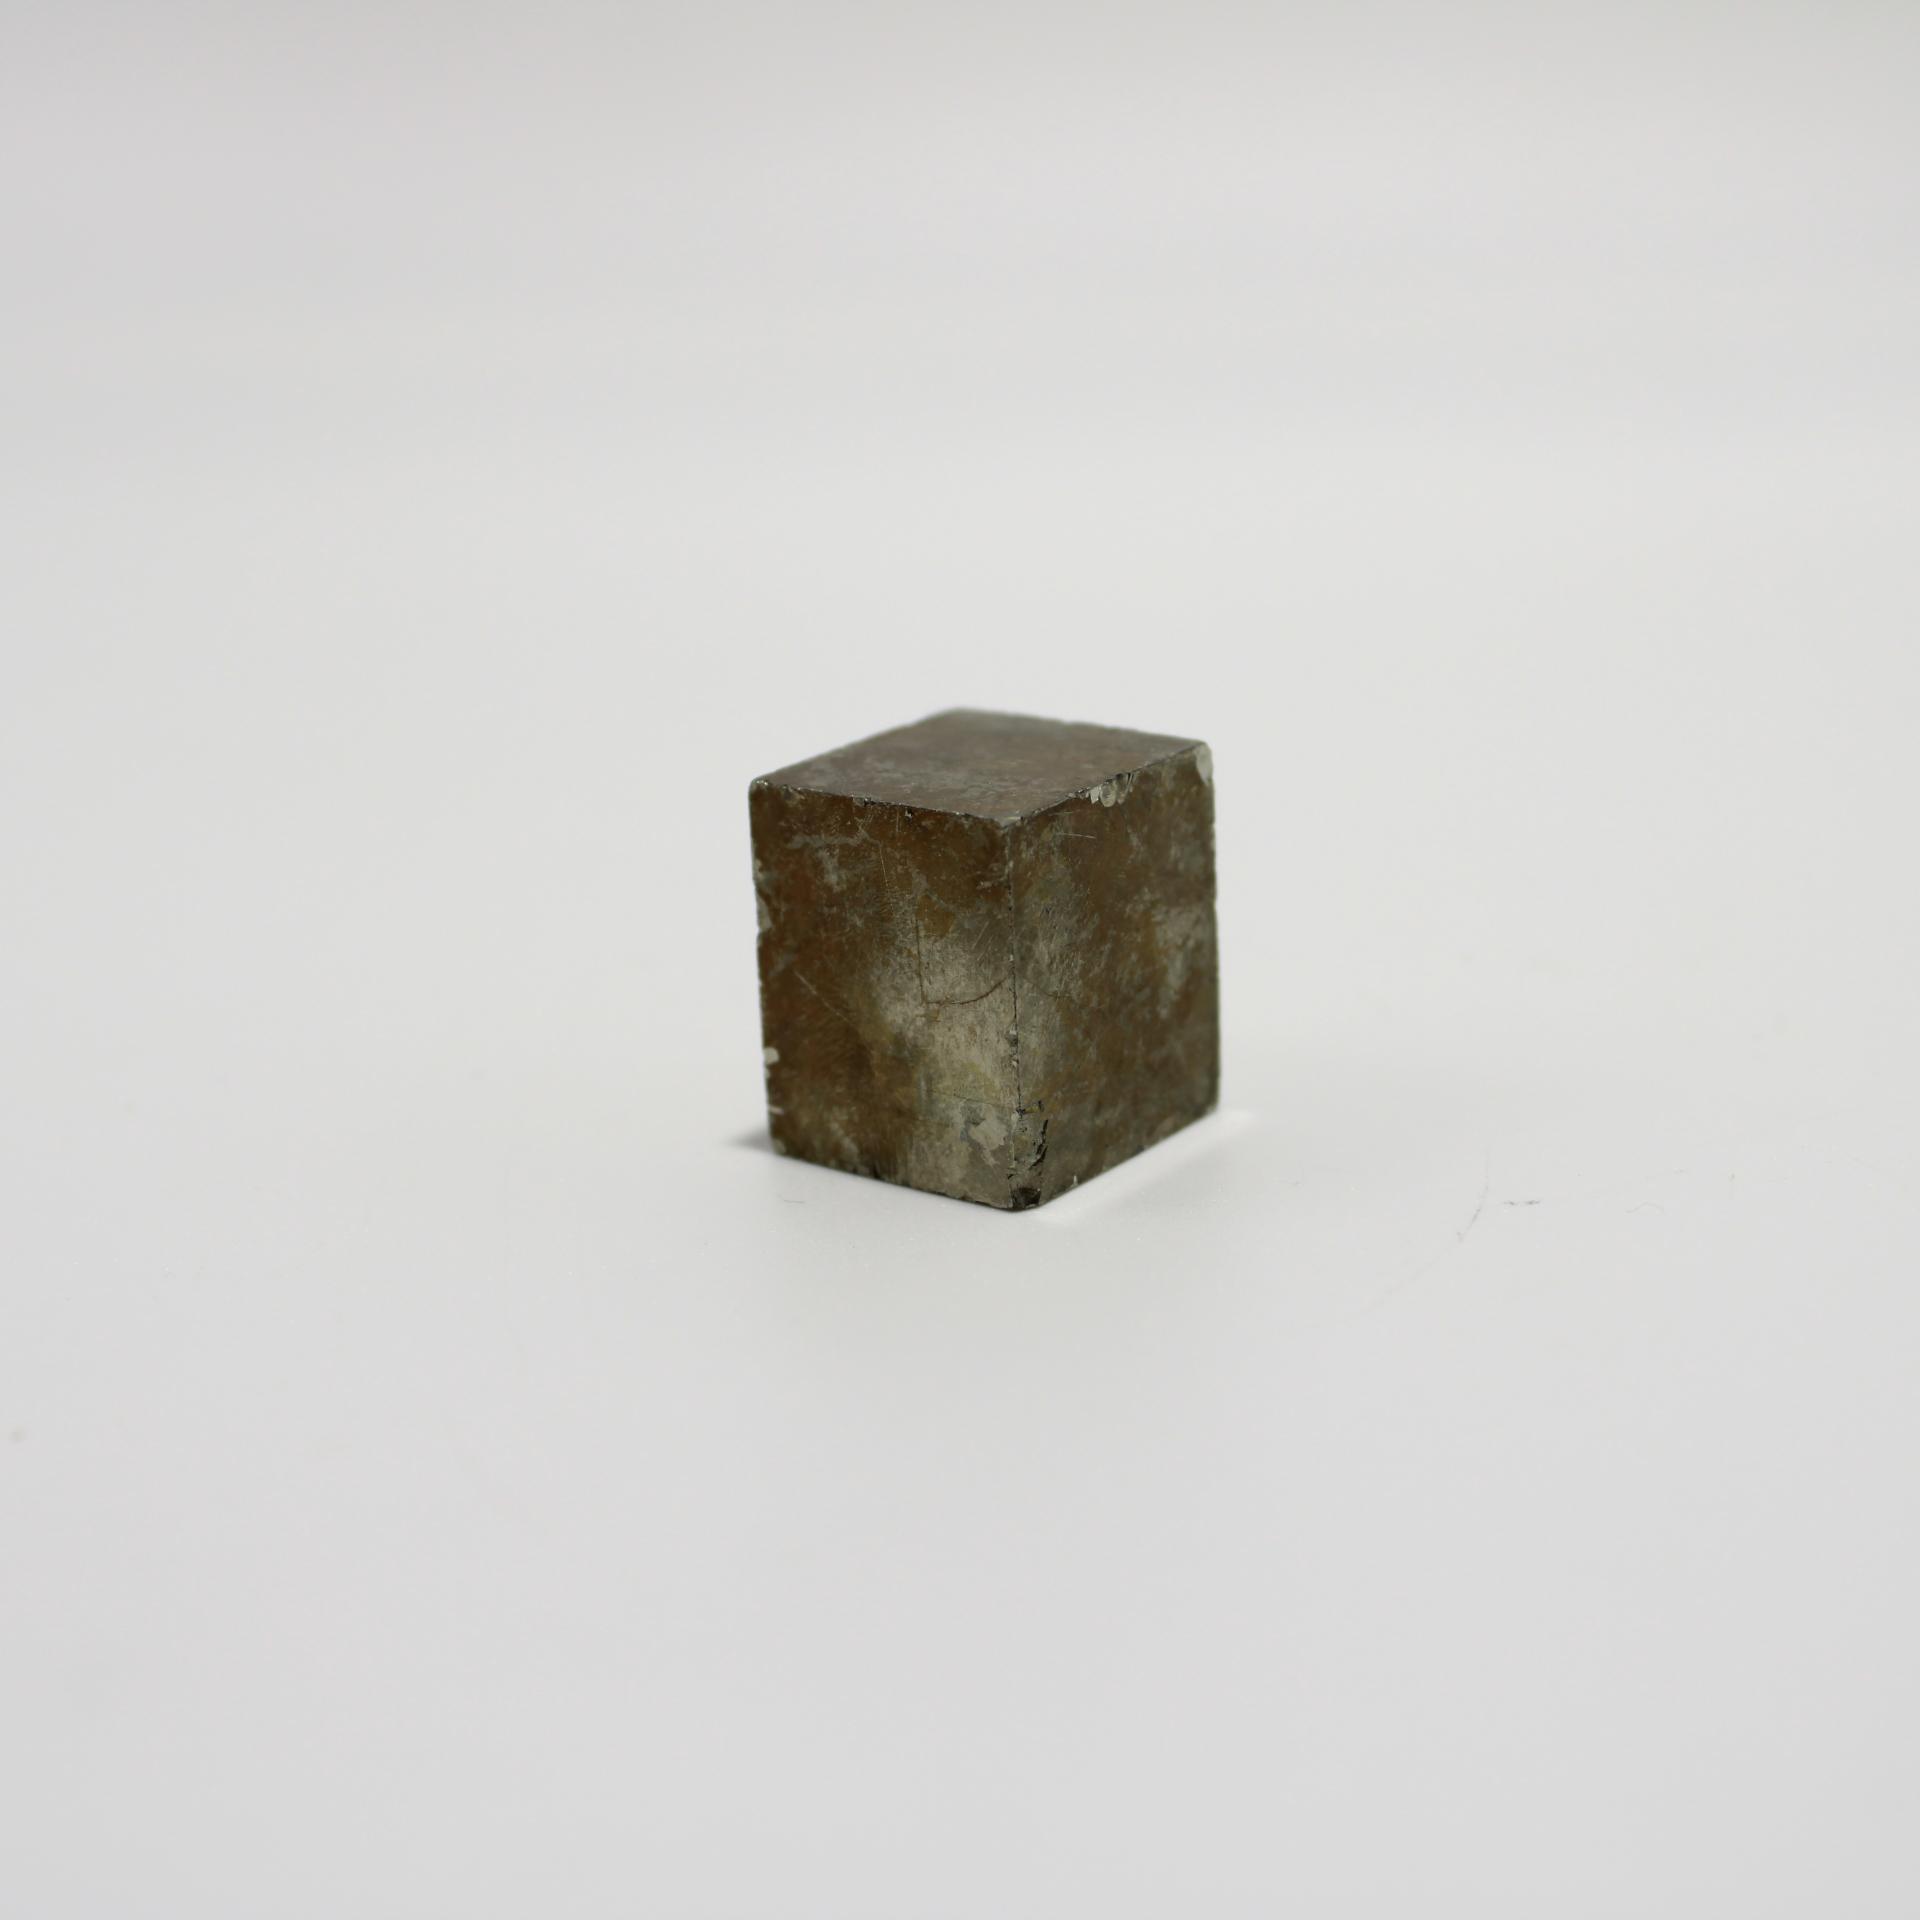 I79 pyritecube 5